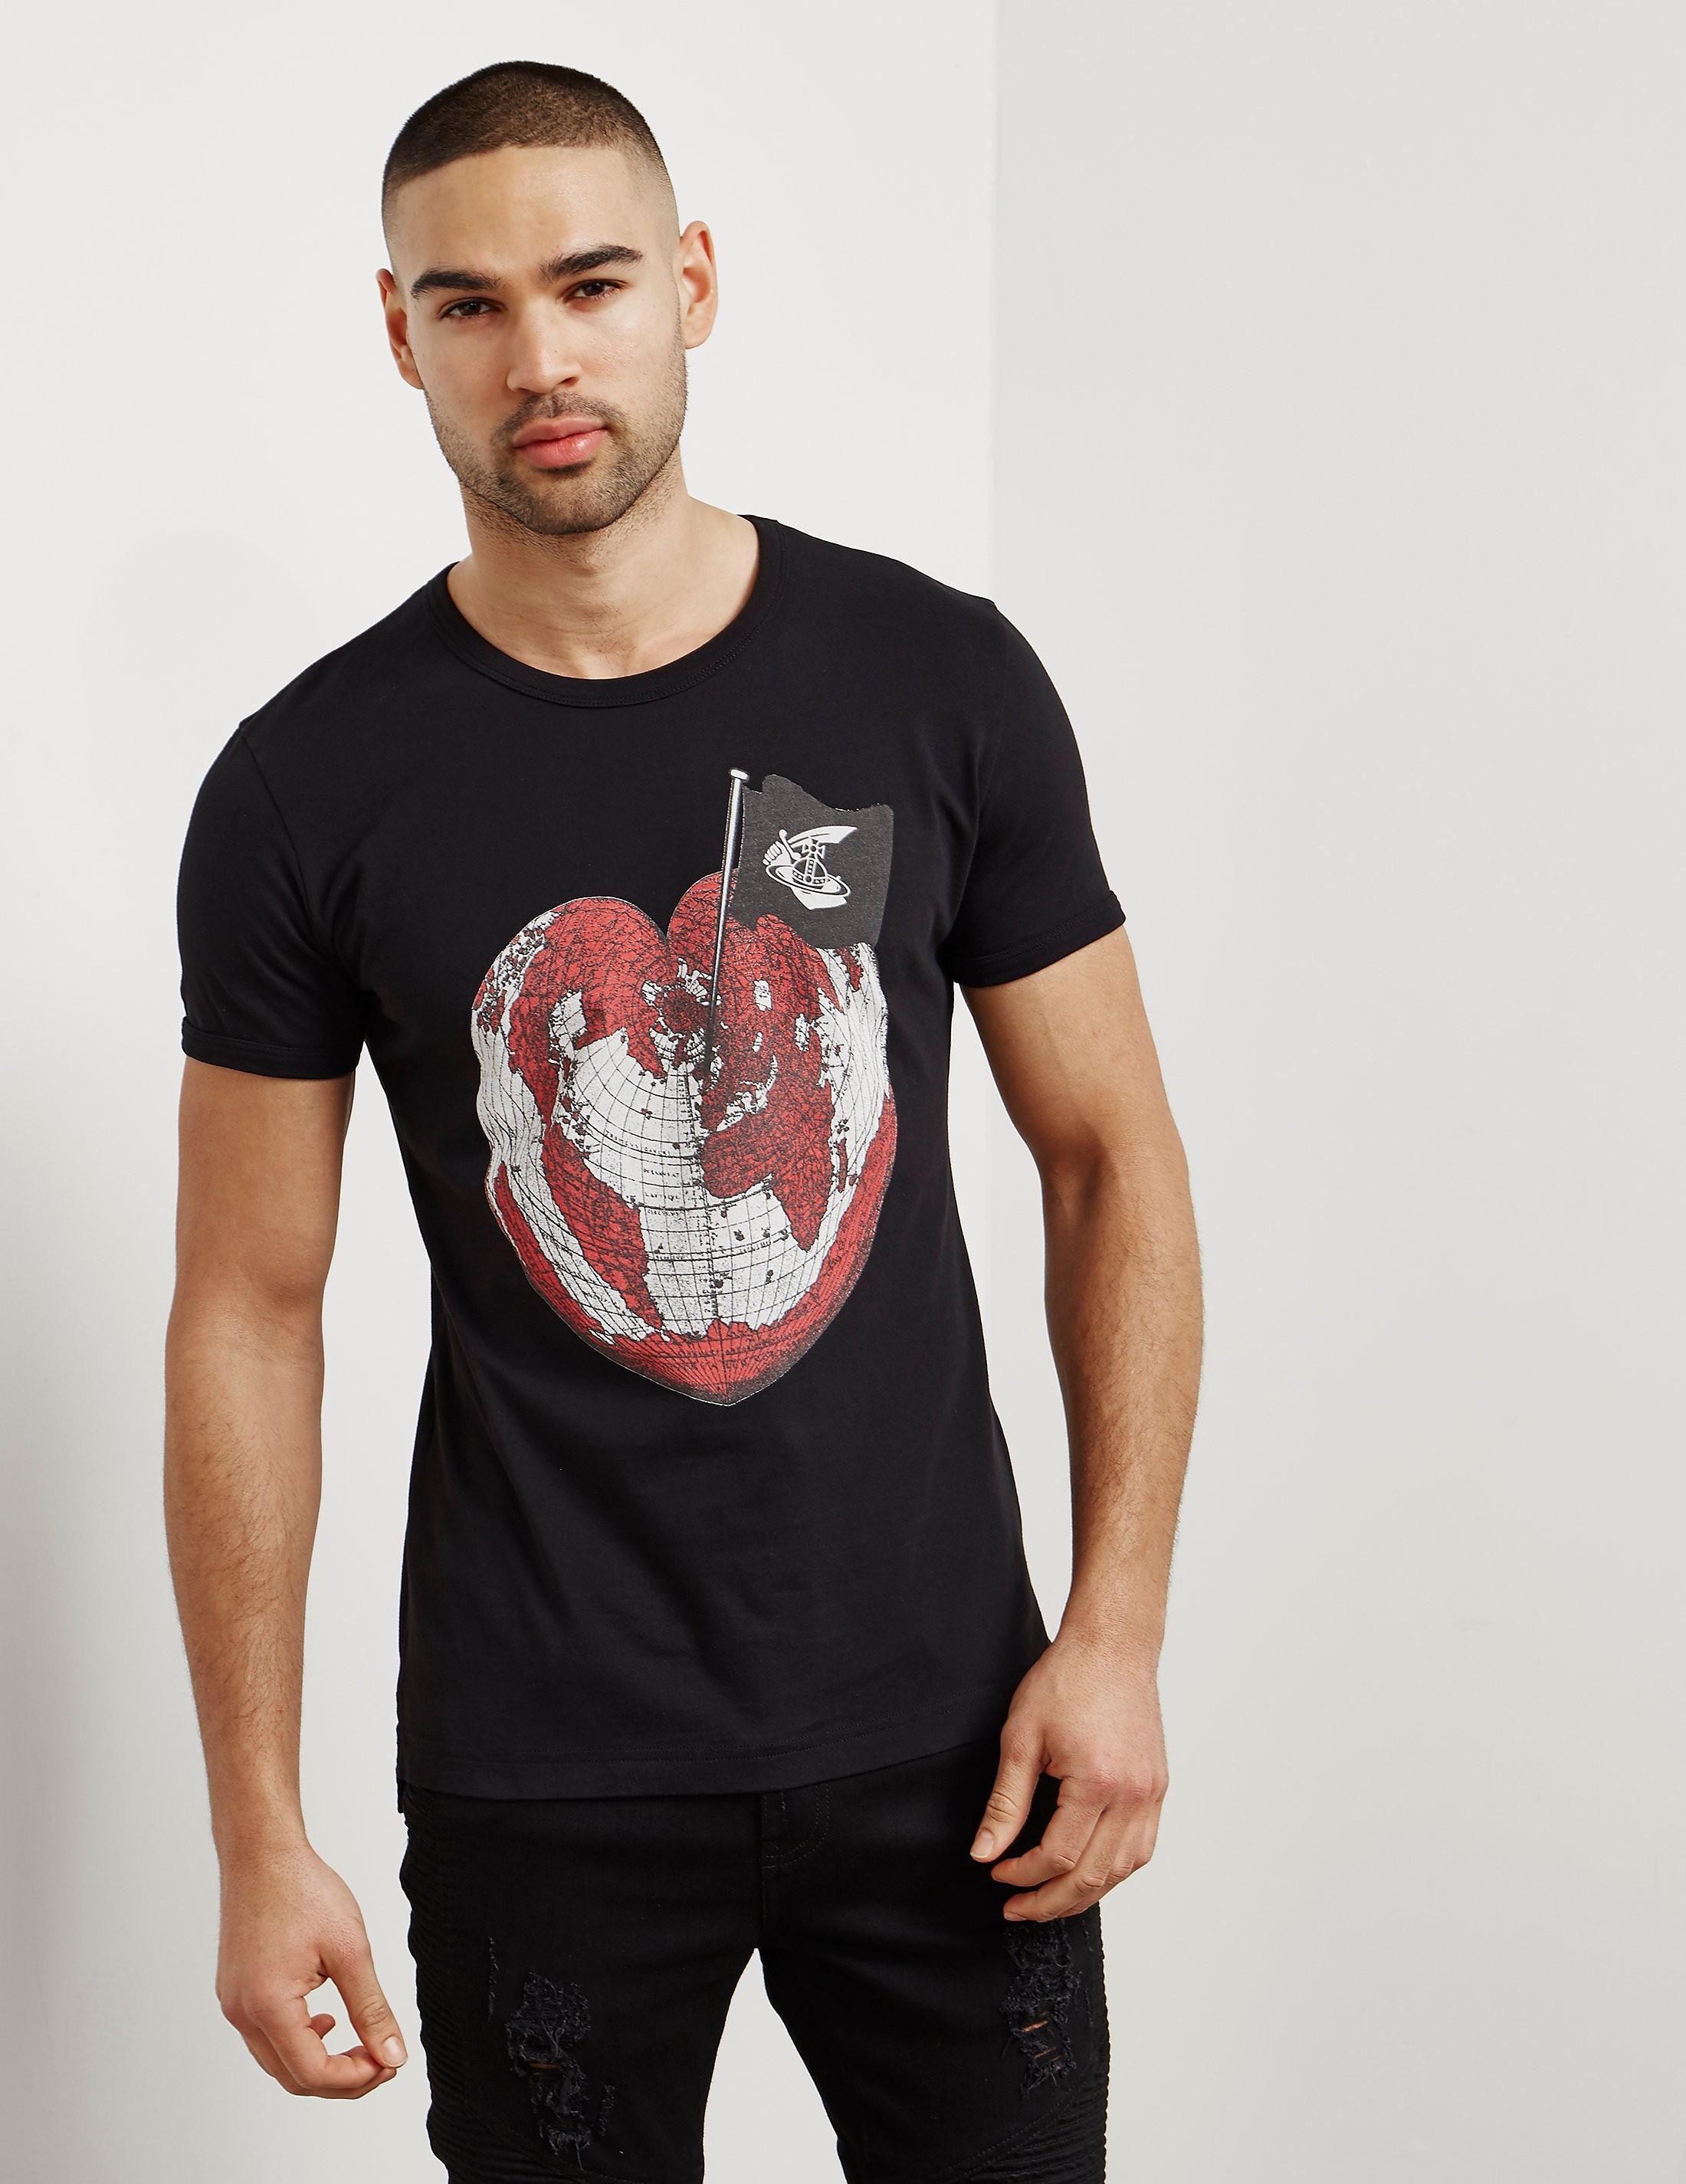 Vivienne Westwood Anglomania World Short Sleeve T-Shirt